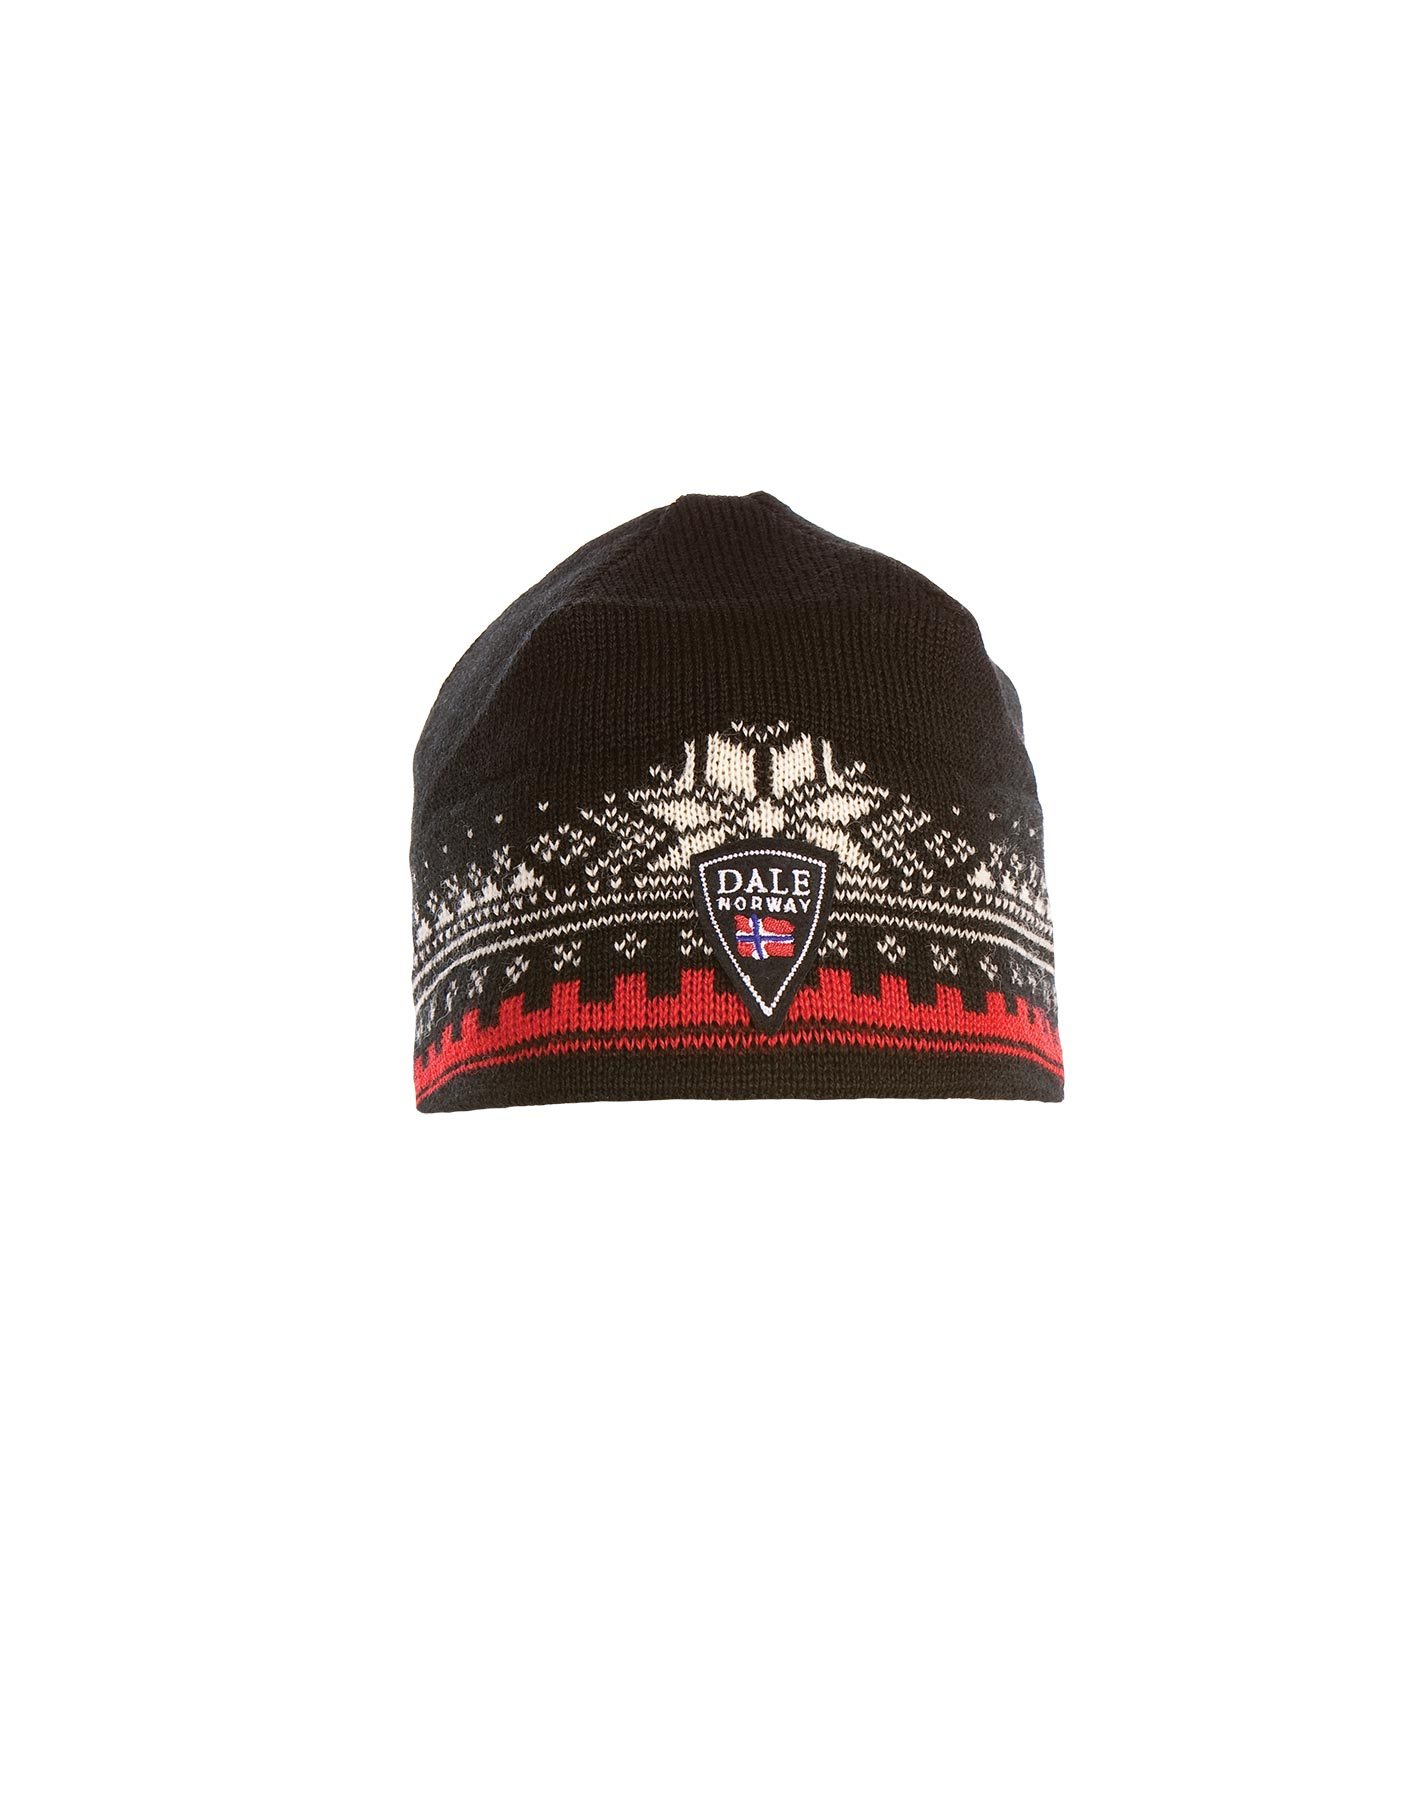 125th Anniversary Hat (1)